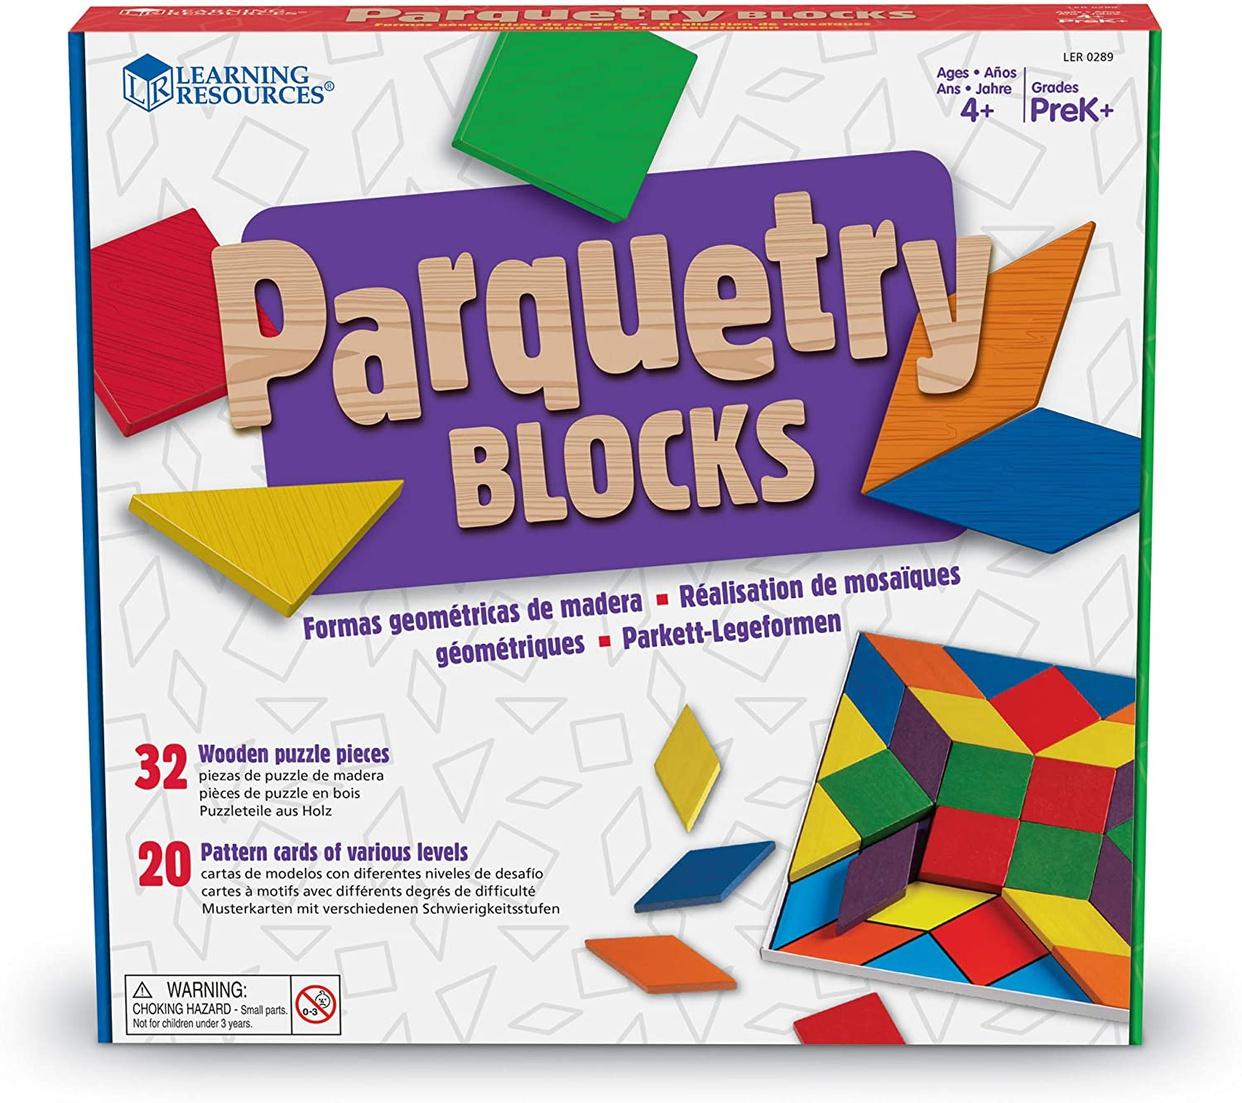 Learning Resources(ラーニングリソーシズ) Parquetry Blocks Super Set LER0289の商品画像